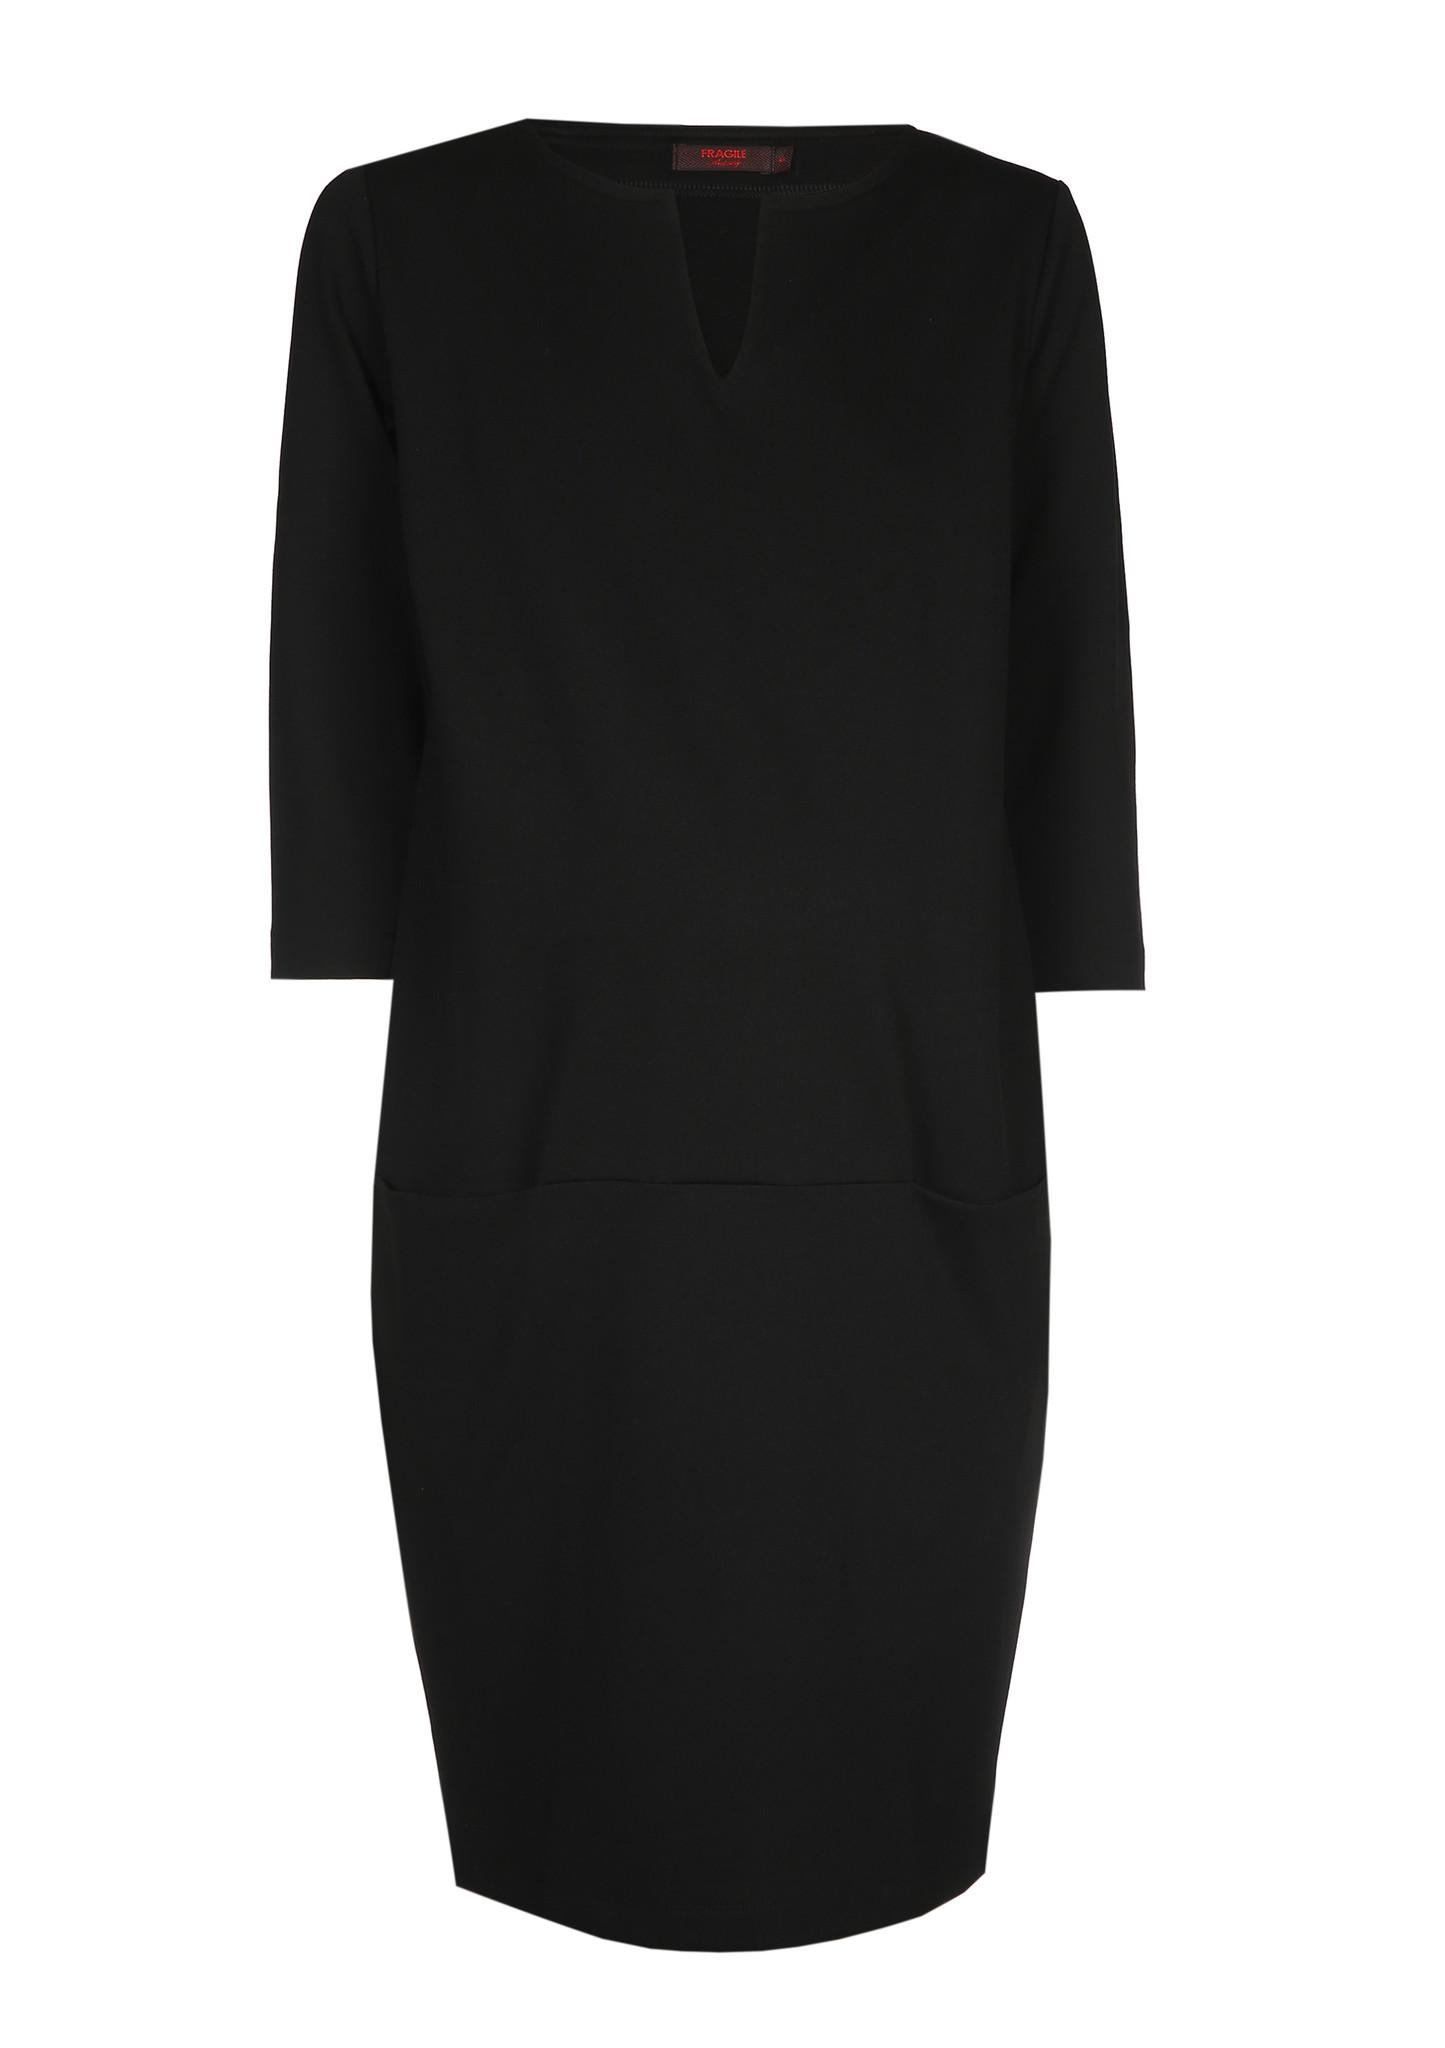 Cool dress - black-1